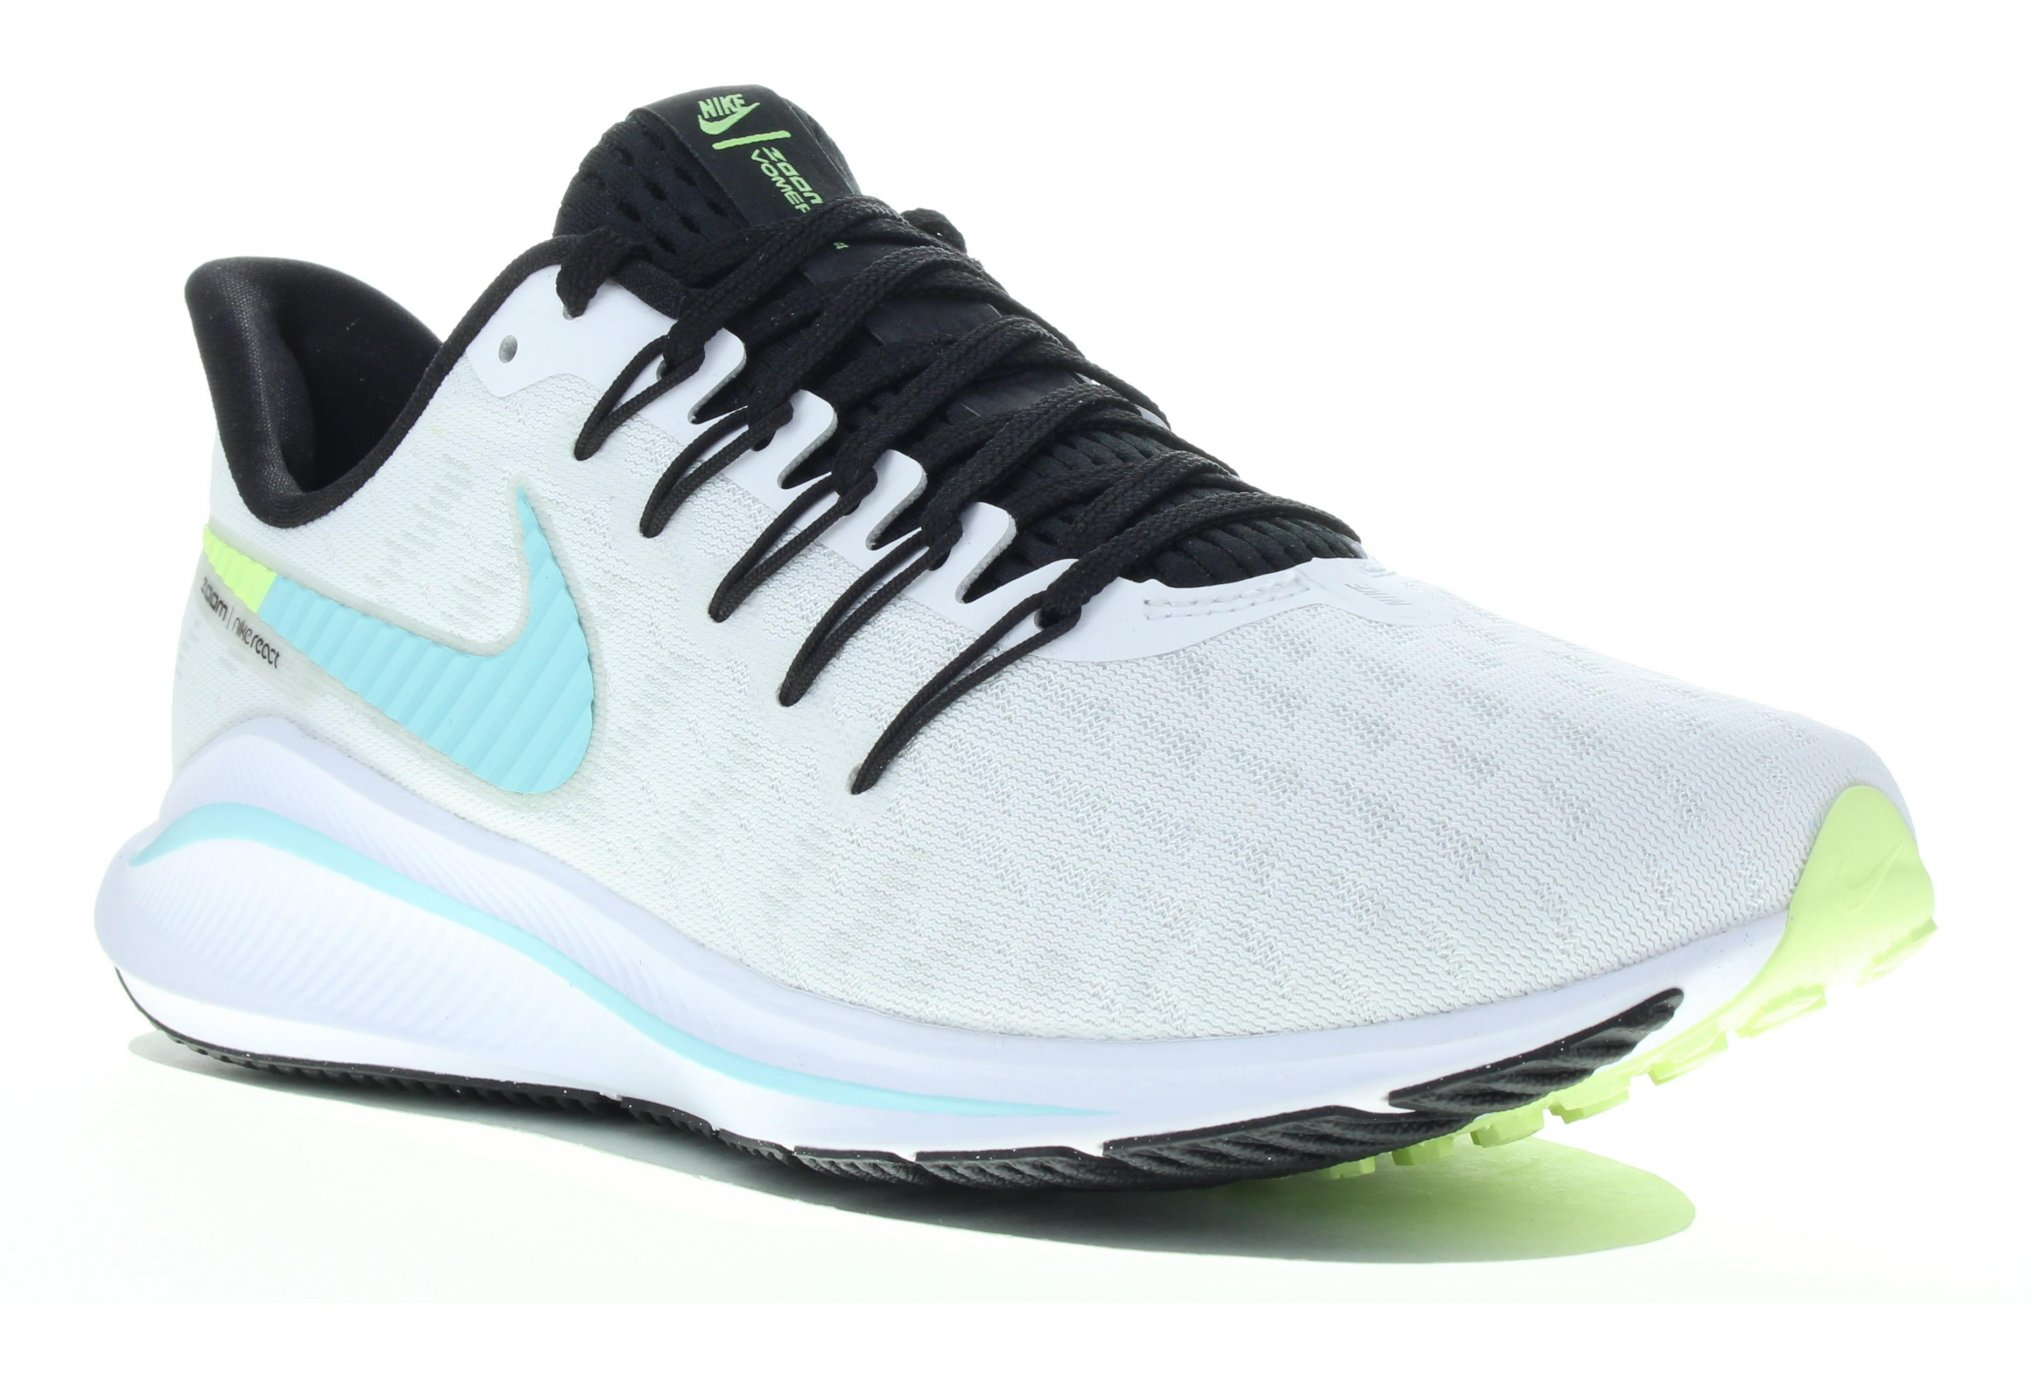 Nike Air Zoom Vomero 14 Chaussures running femme